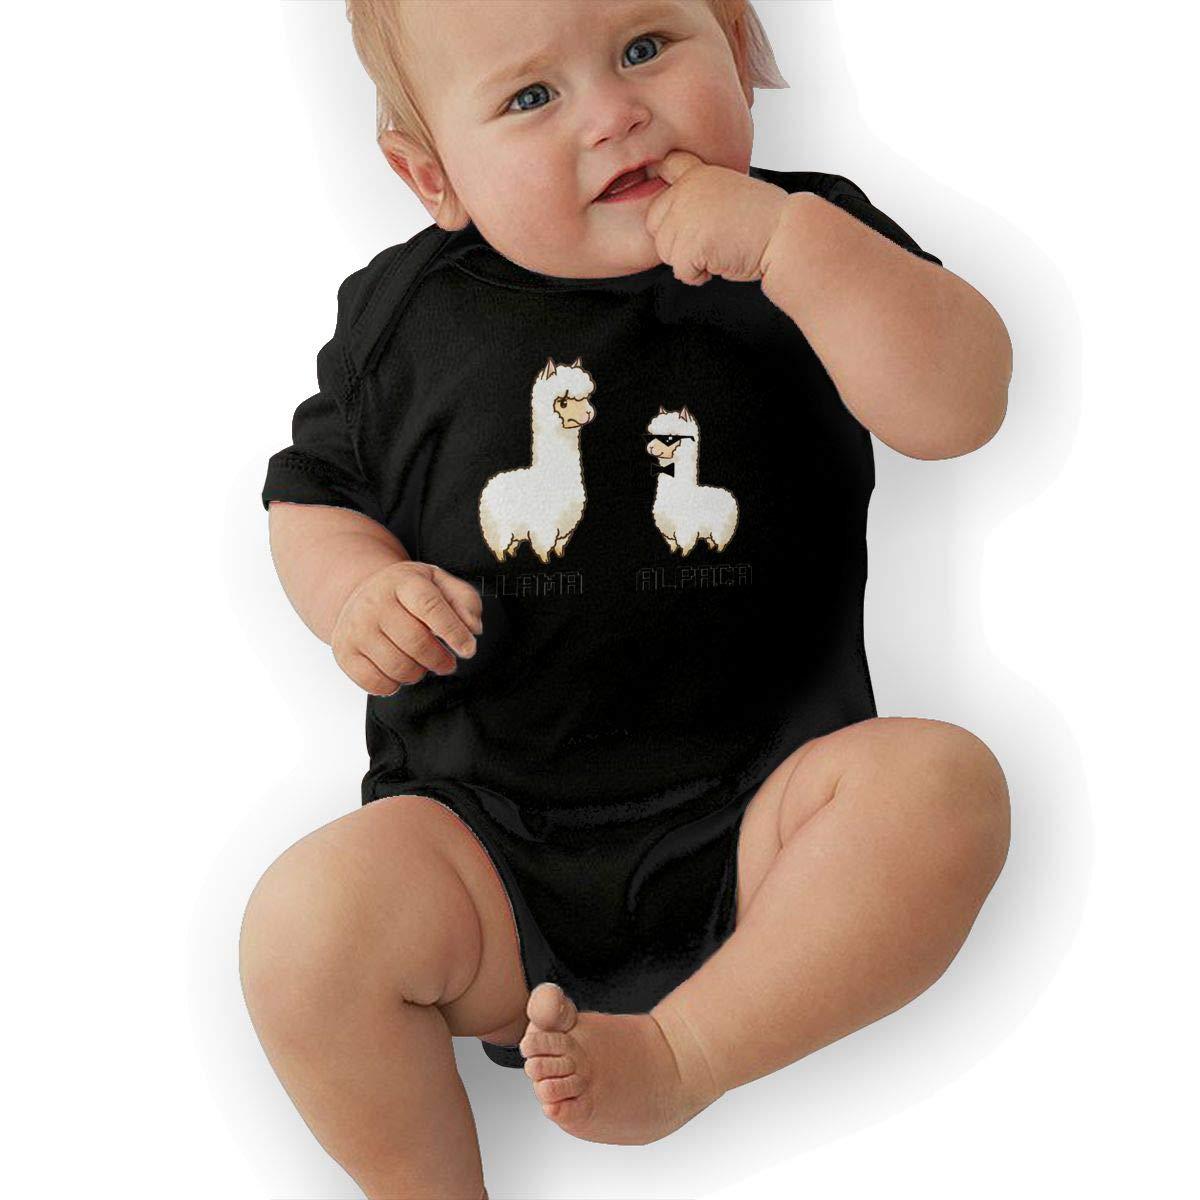 HappyLifea Llama Vs Alpaca Newborn Baby Short Sleeve Romper Infant Summer Clothing